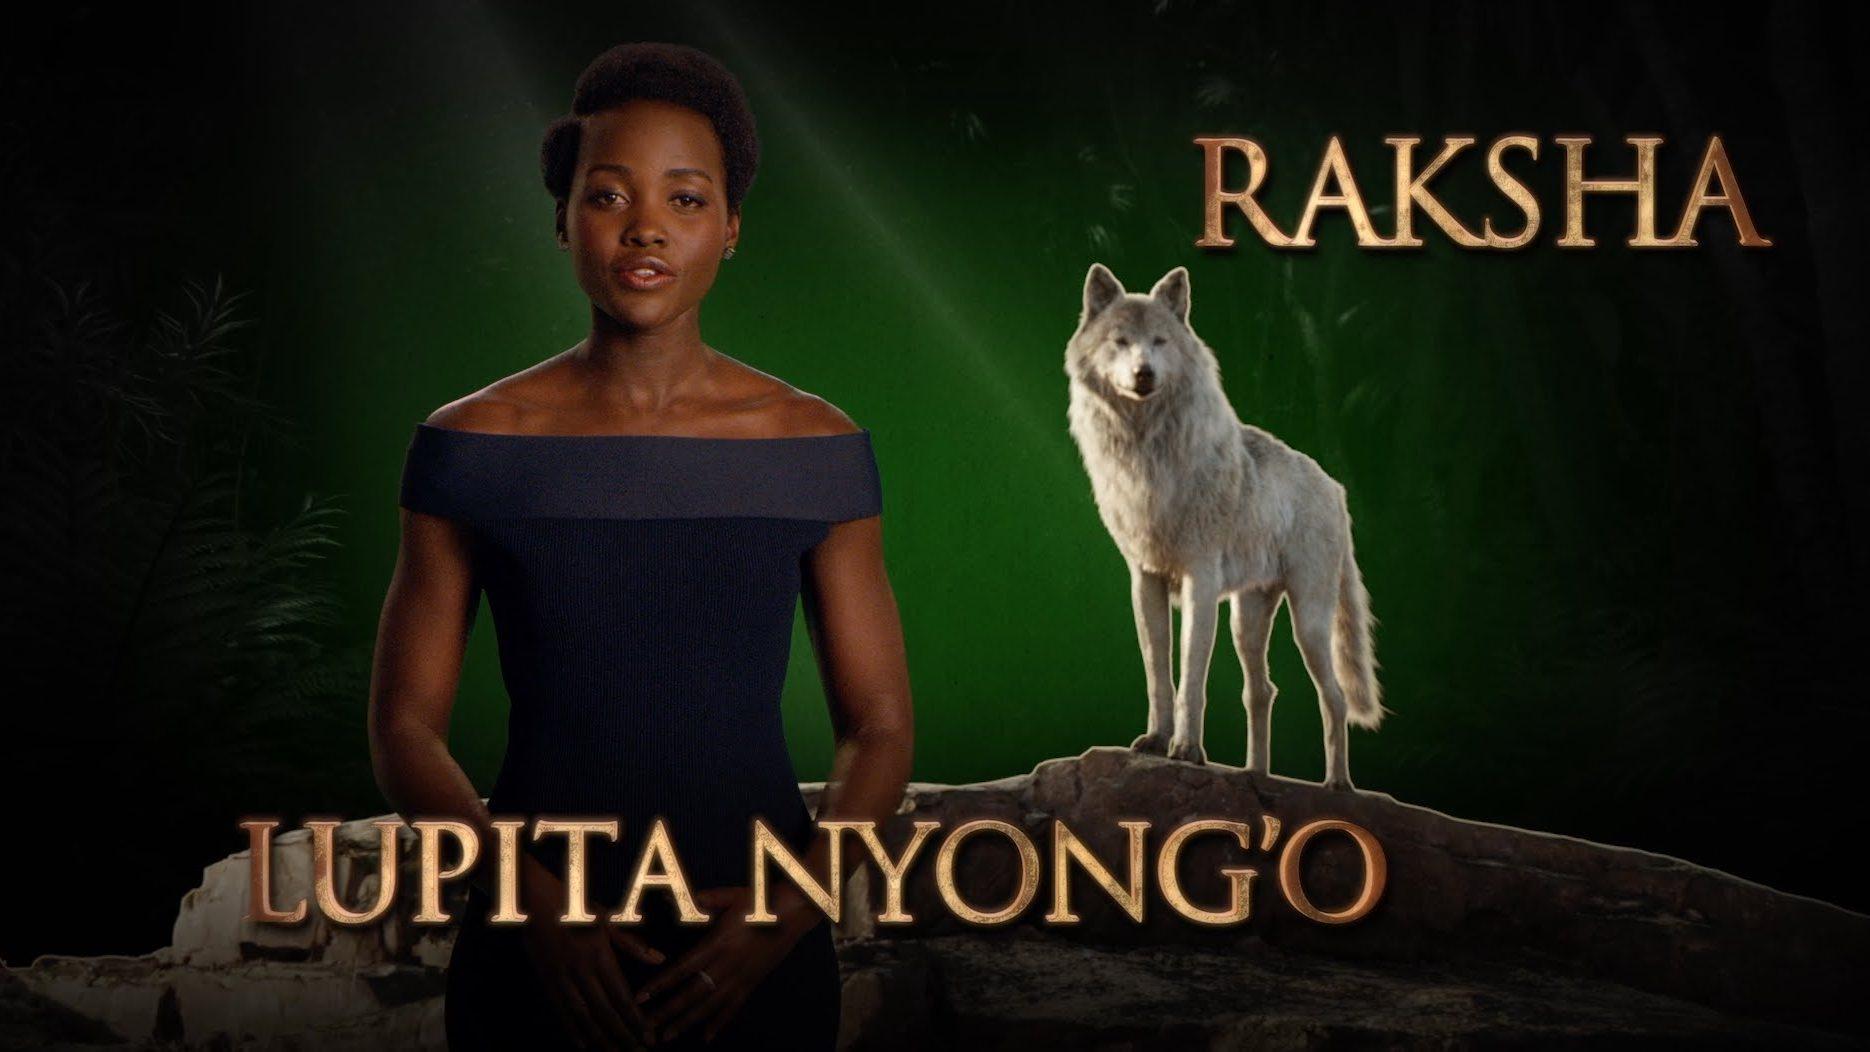 Lupita Nyong'o is Raksha – Disney's The Jungle Book